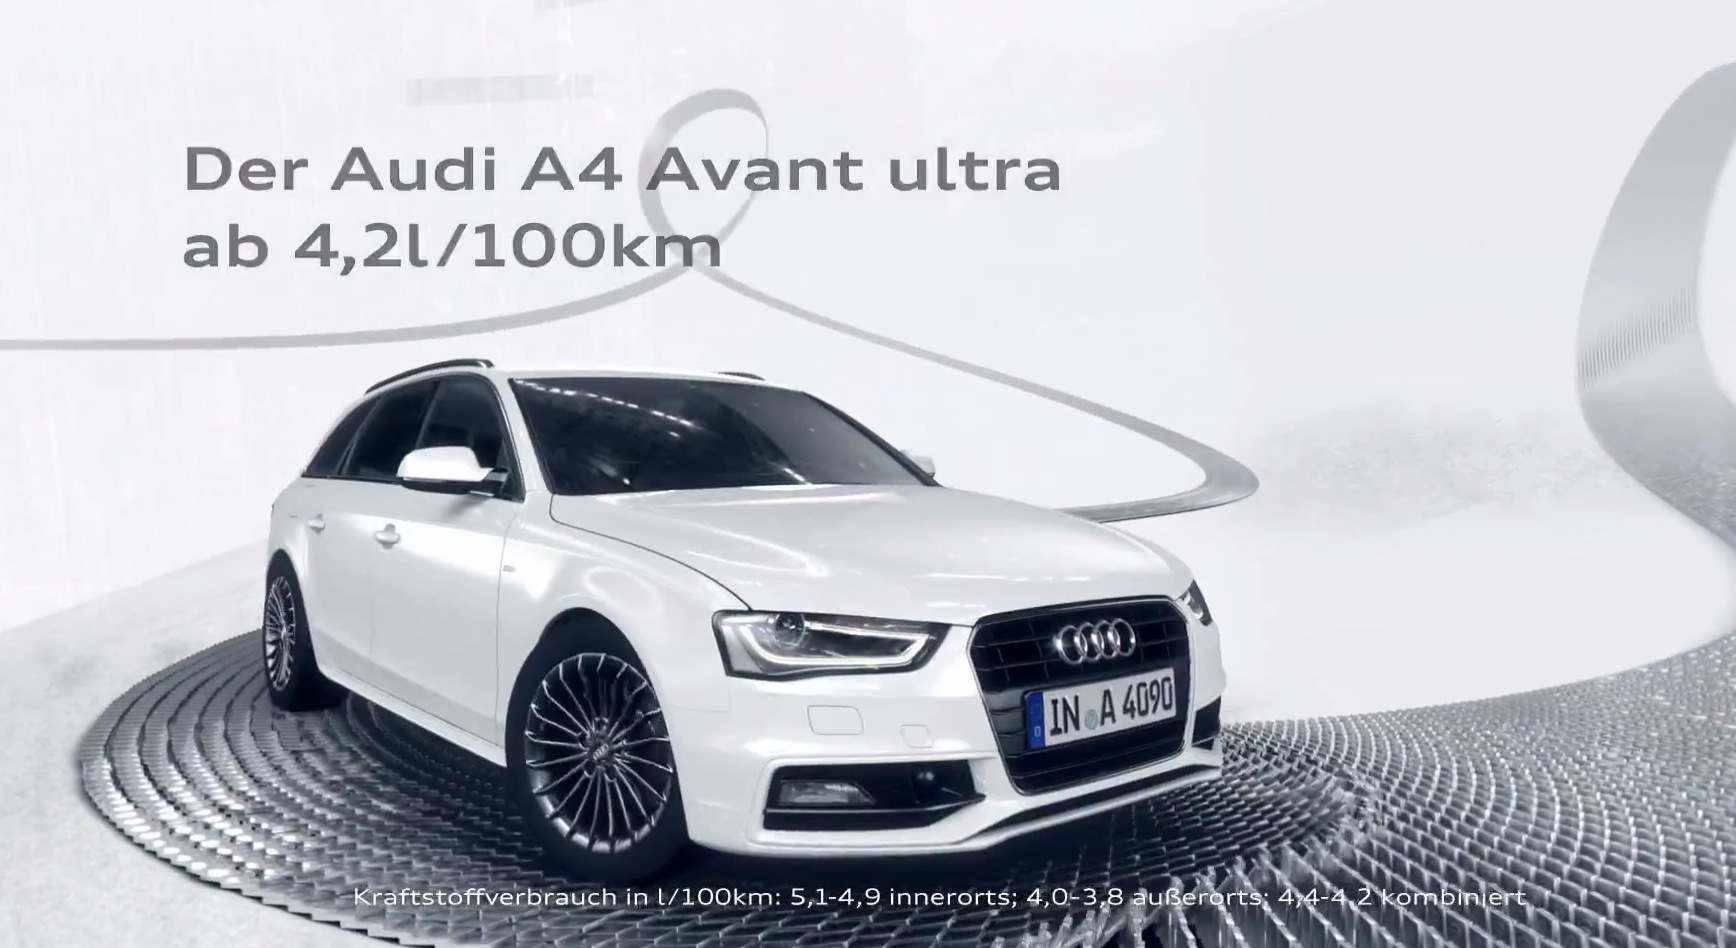 Audi A Ultra Commercial Domino Autoevolution - Audi commercial